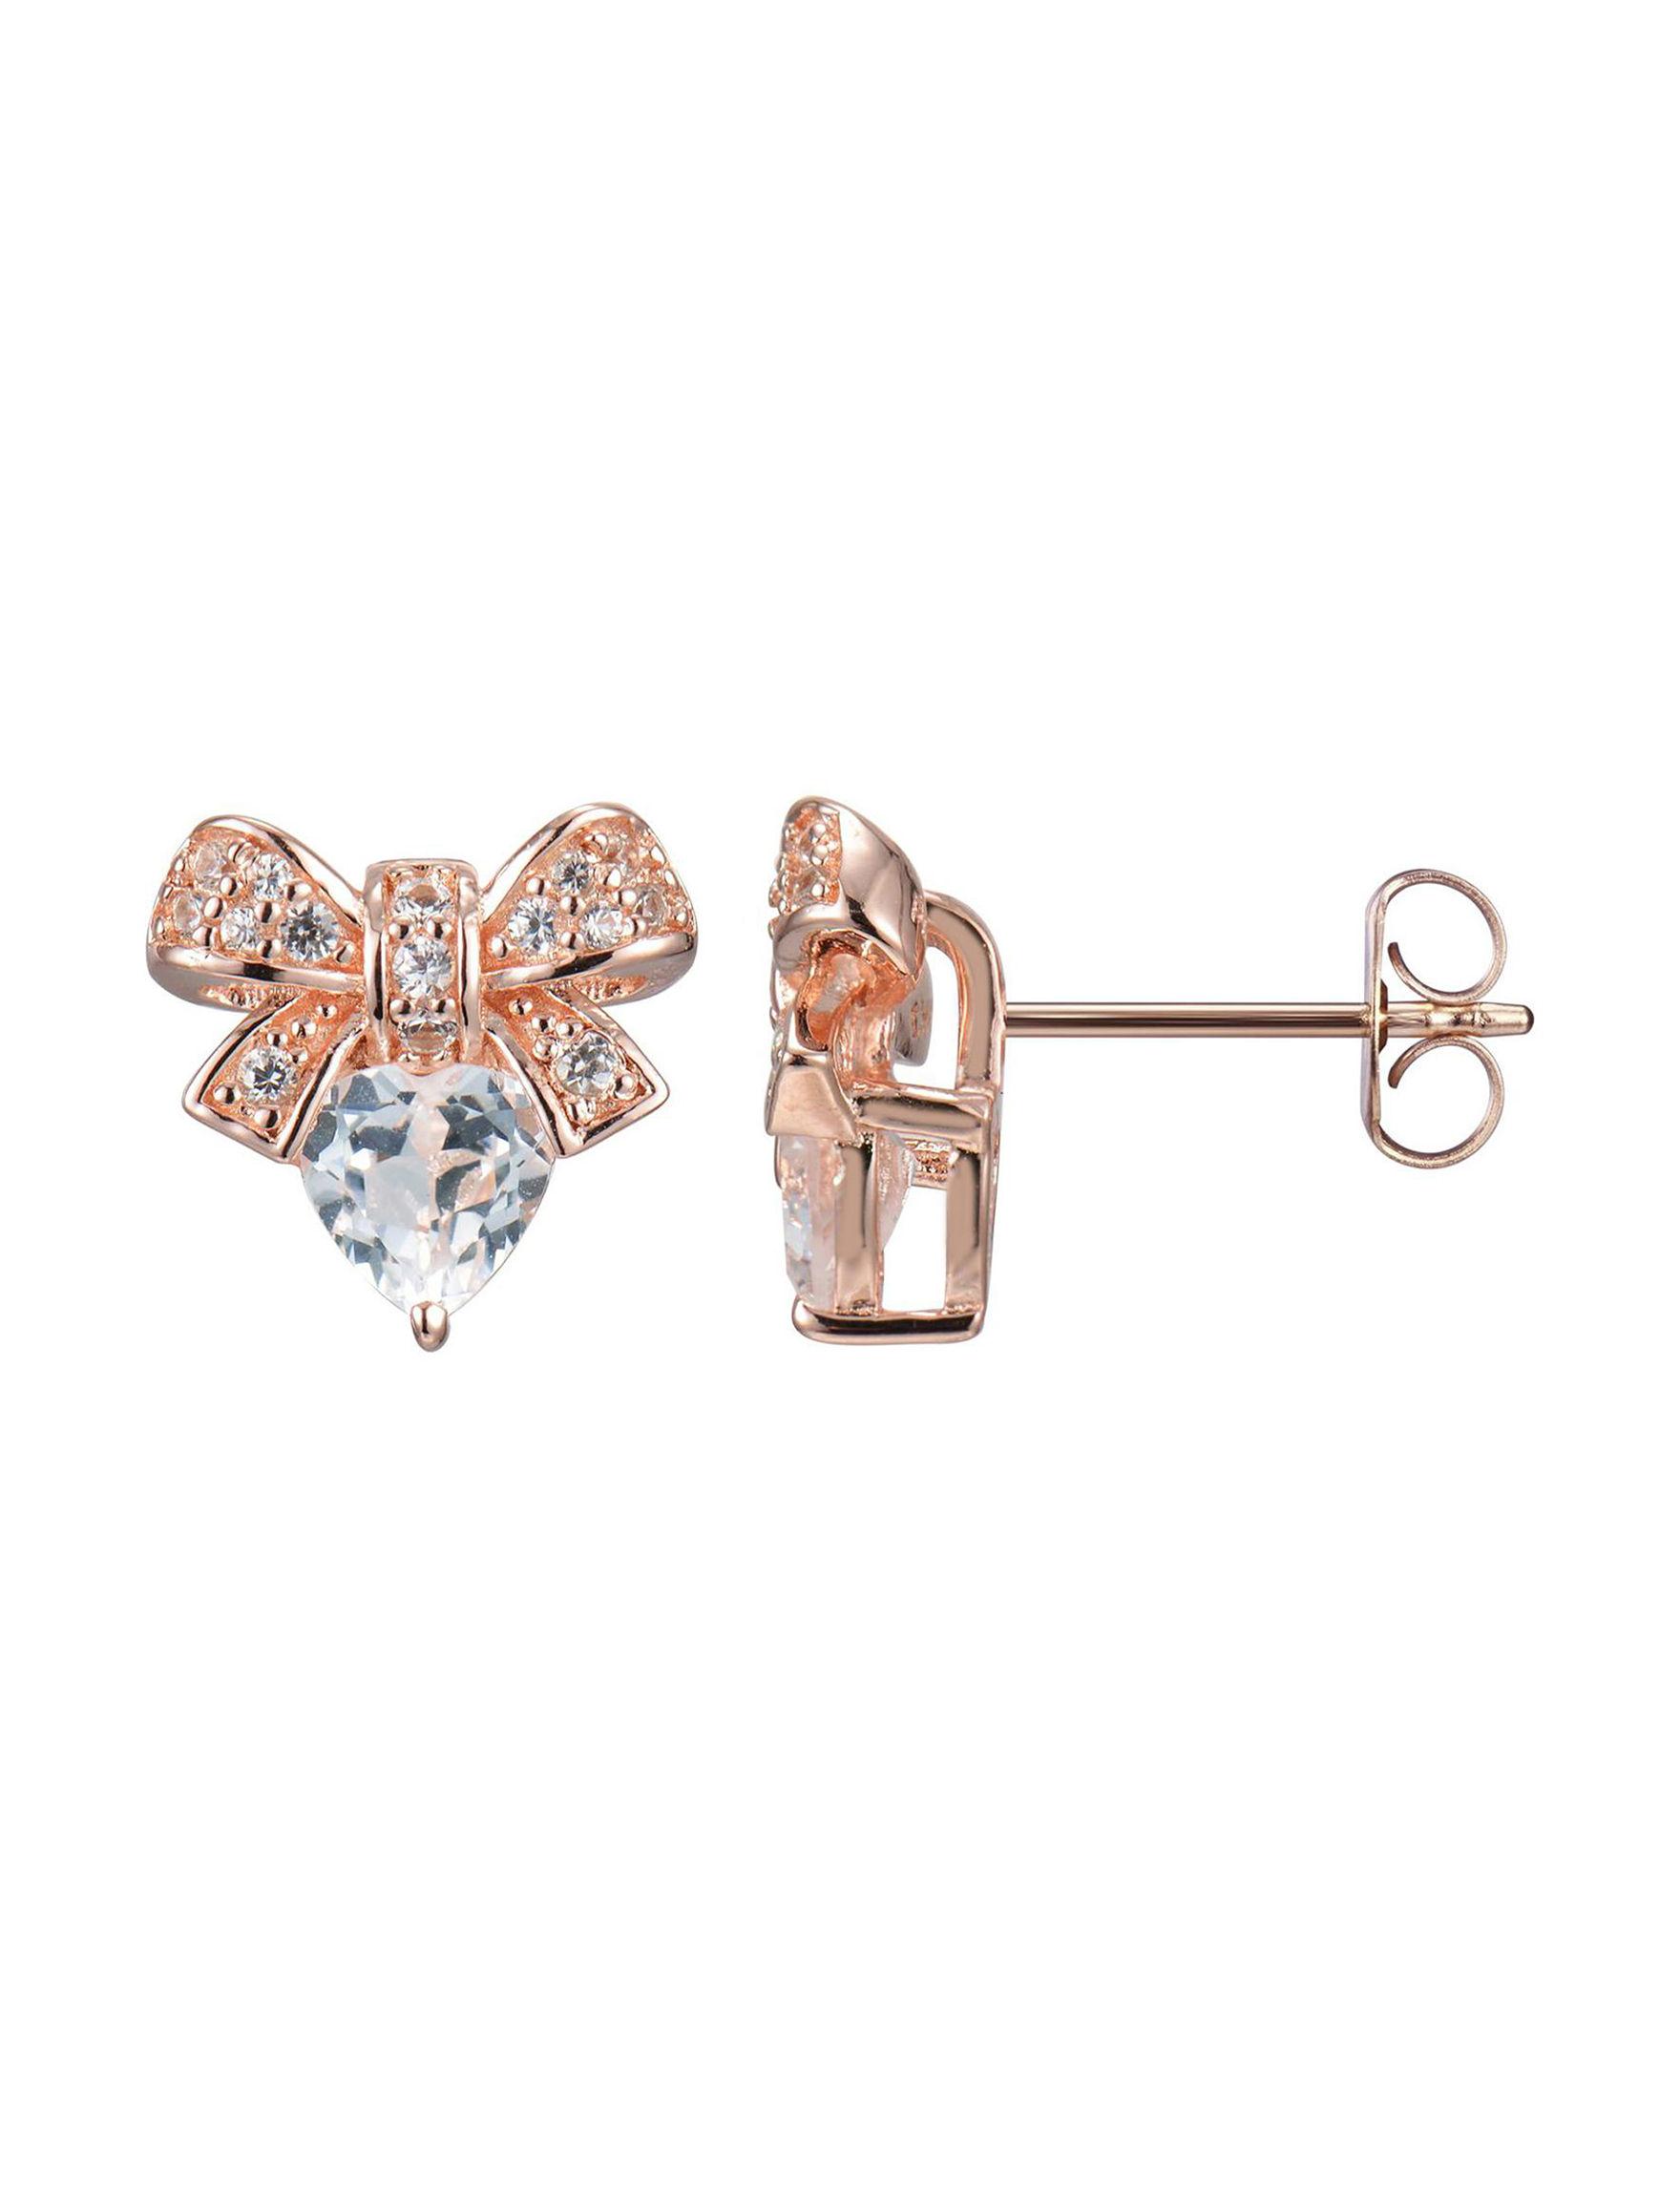 PAJ INC. Rose Gold Studs Earrings Fine Jewelry